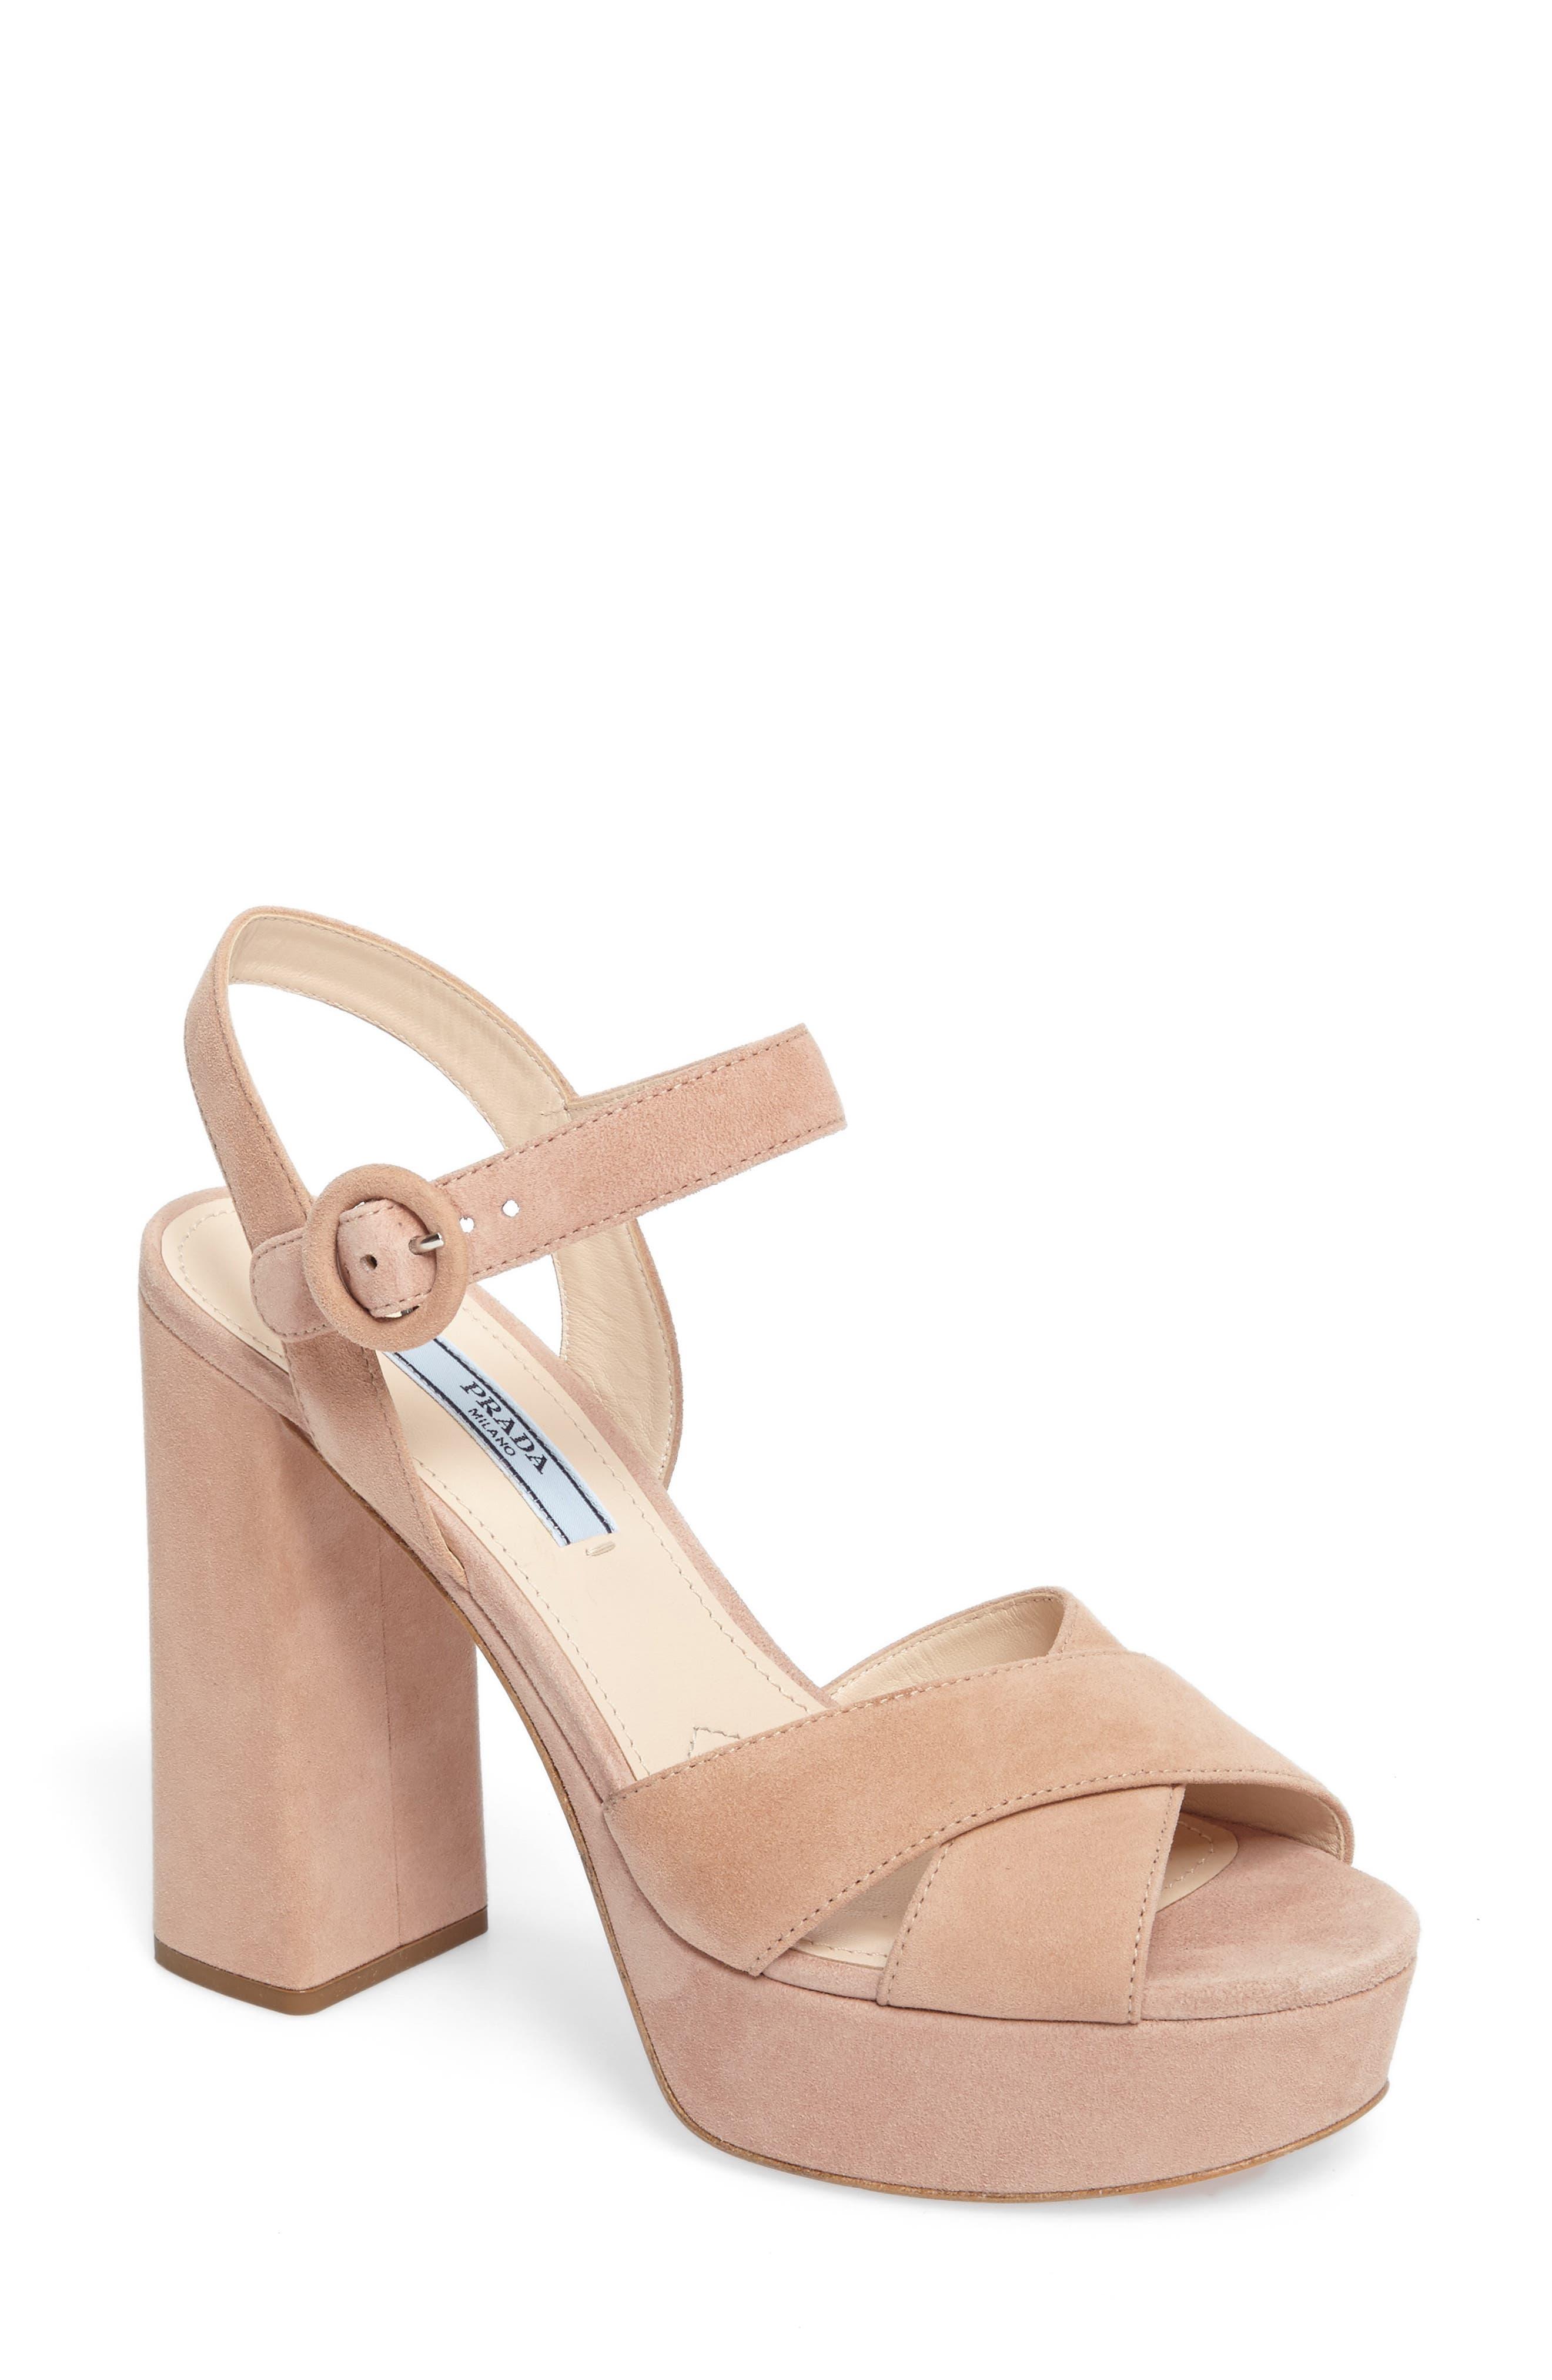 Block Heel Platform Sandal,                             Main thumbnail 1, color,                             250